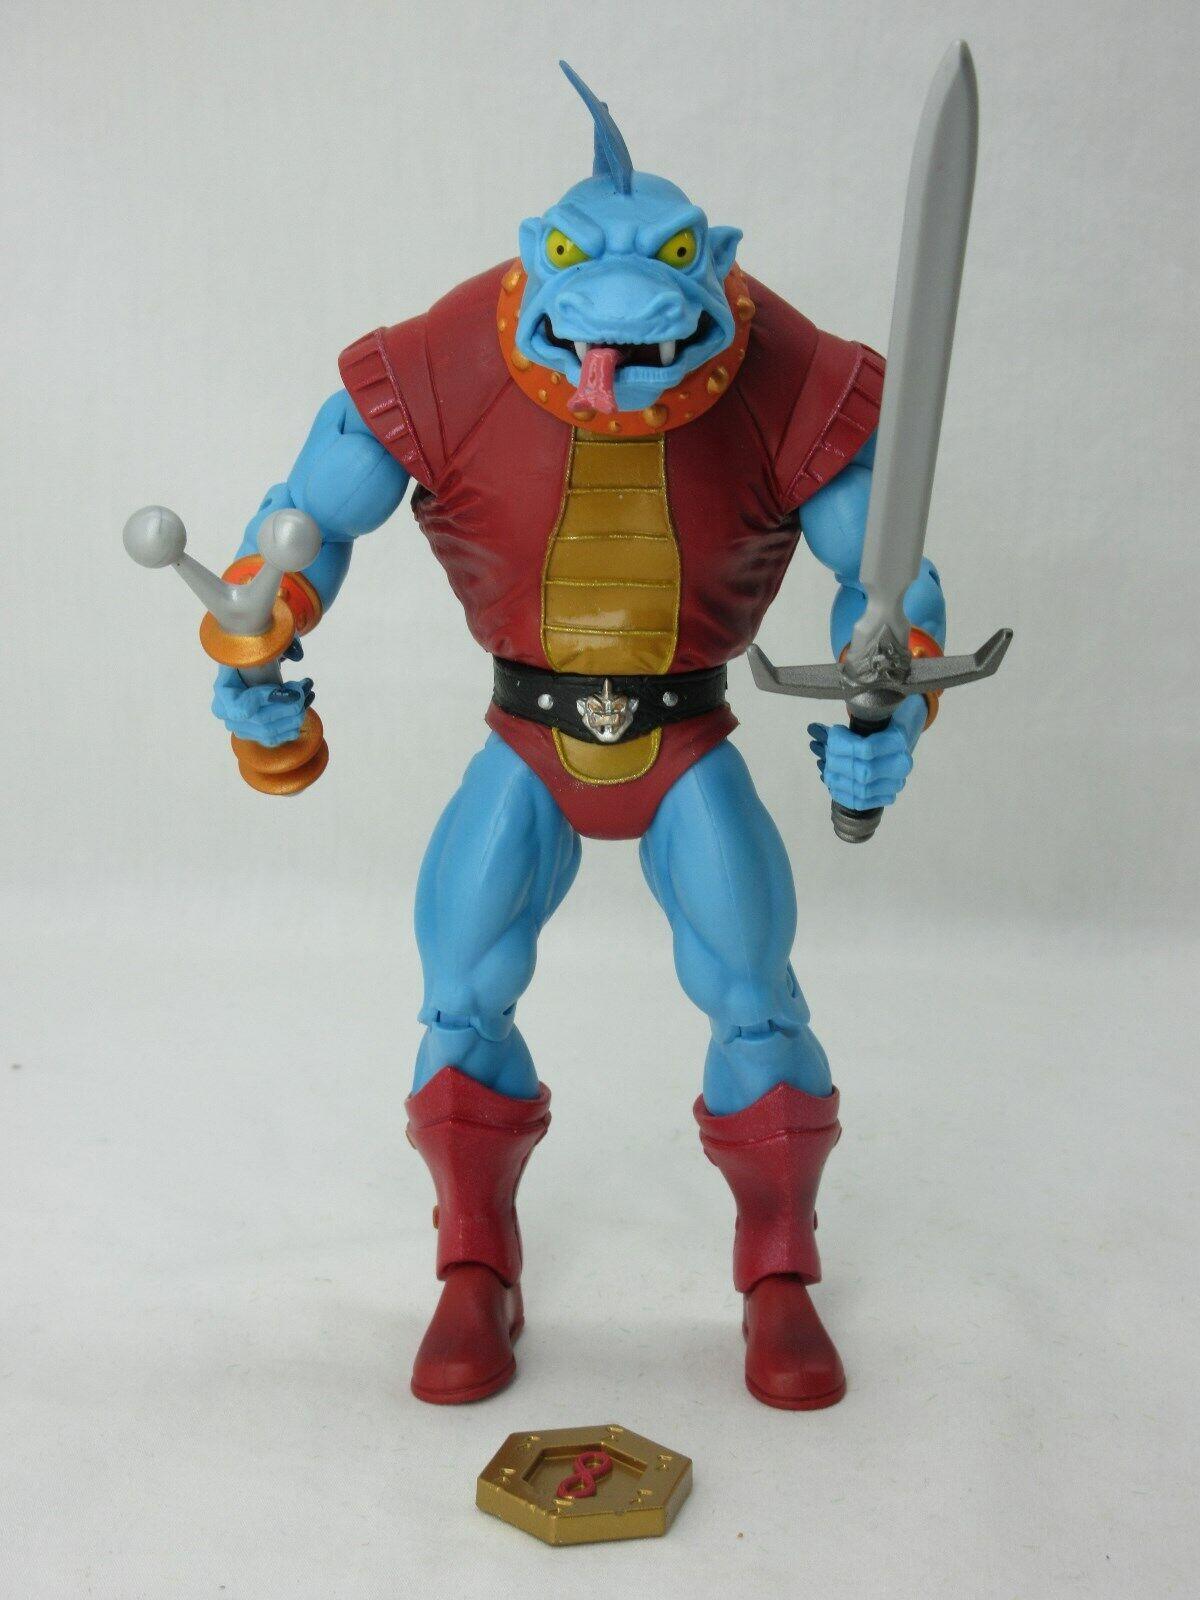 MOTUC,MOTU,FANG MAN,Masters Of Of Of The Universe Classics,100% Complete,He man 3514c8